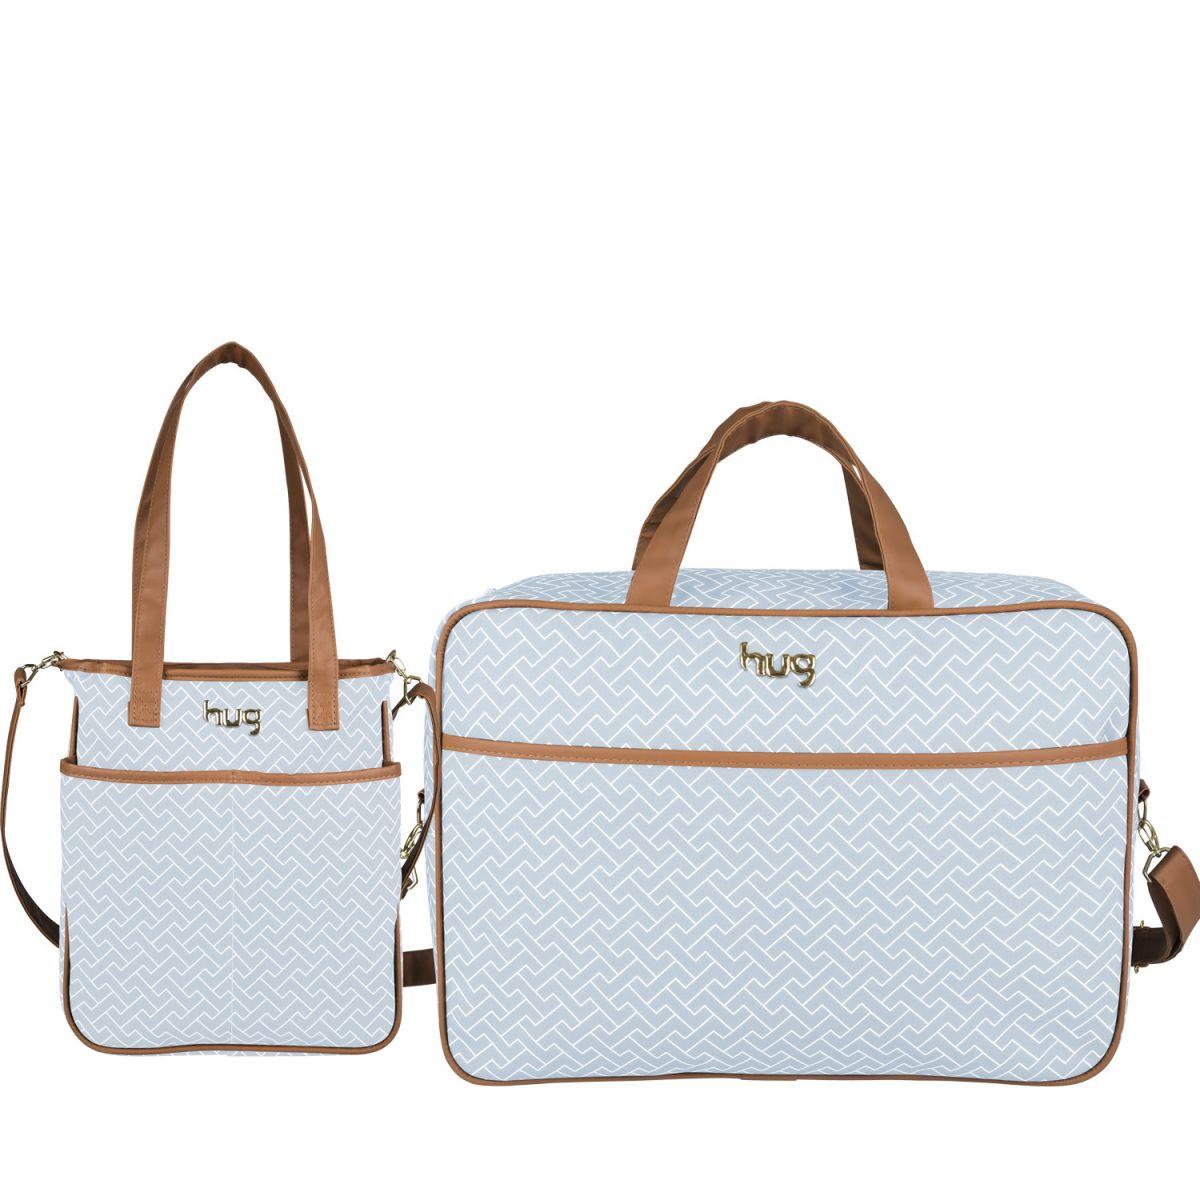 Bolsa Hug Dourada : Kit de bolsa maternidade hug xod? m e mala azul beb? na